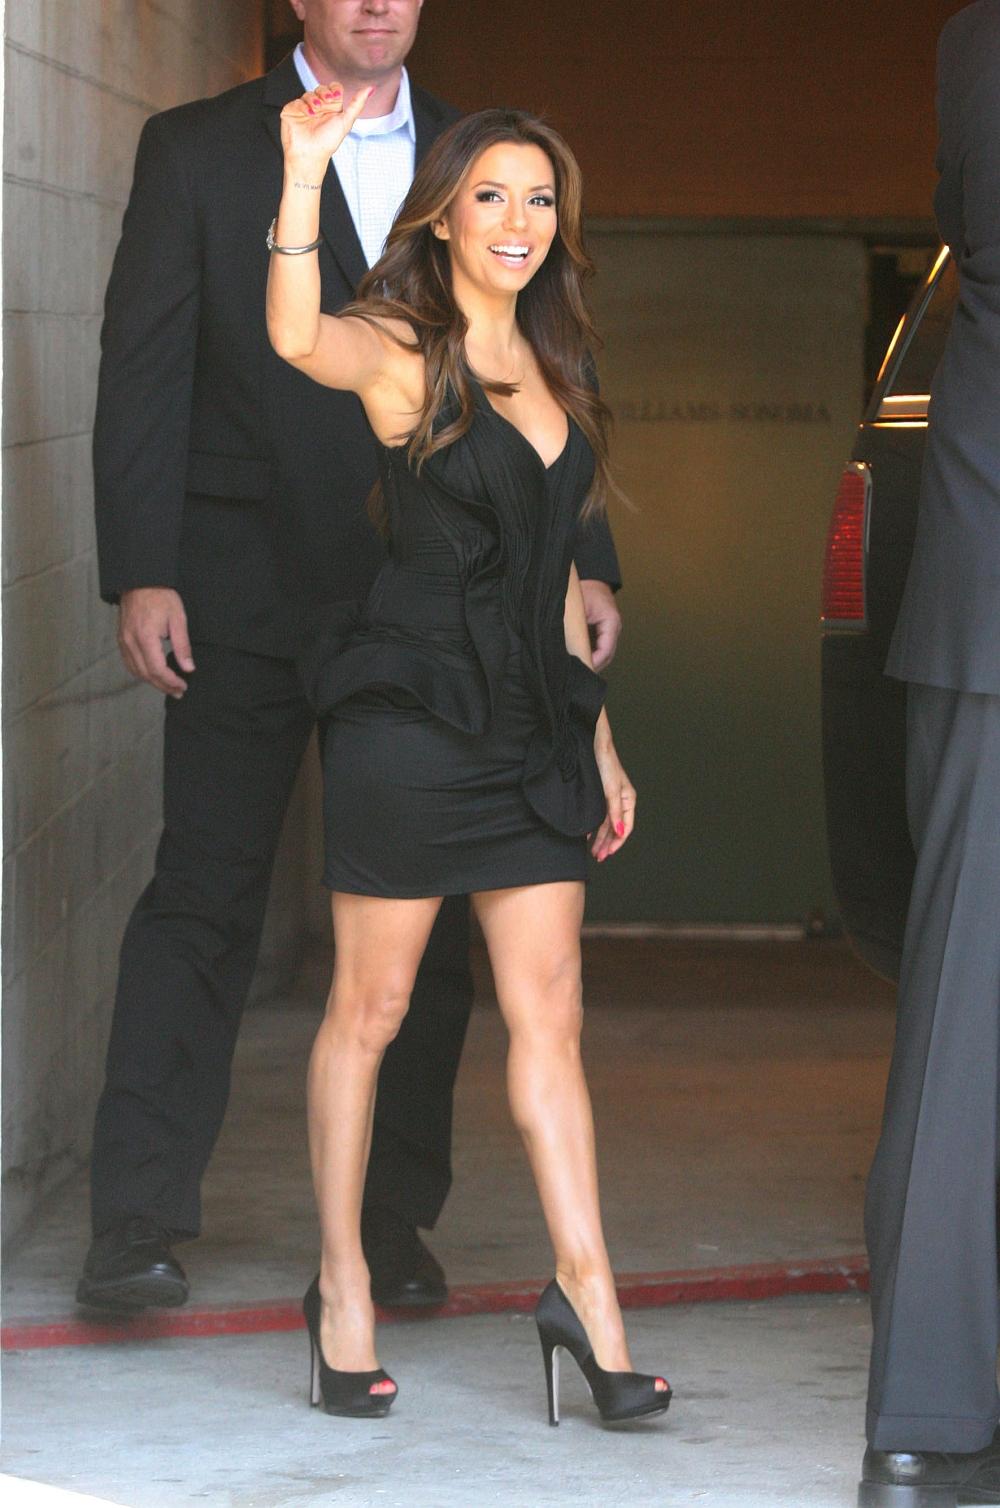 856e6790dbf Eva Longoria Has Beautiful Legs in a Short and Sexy Little Black ...